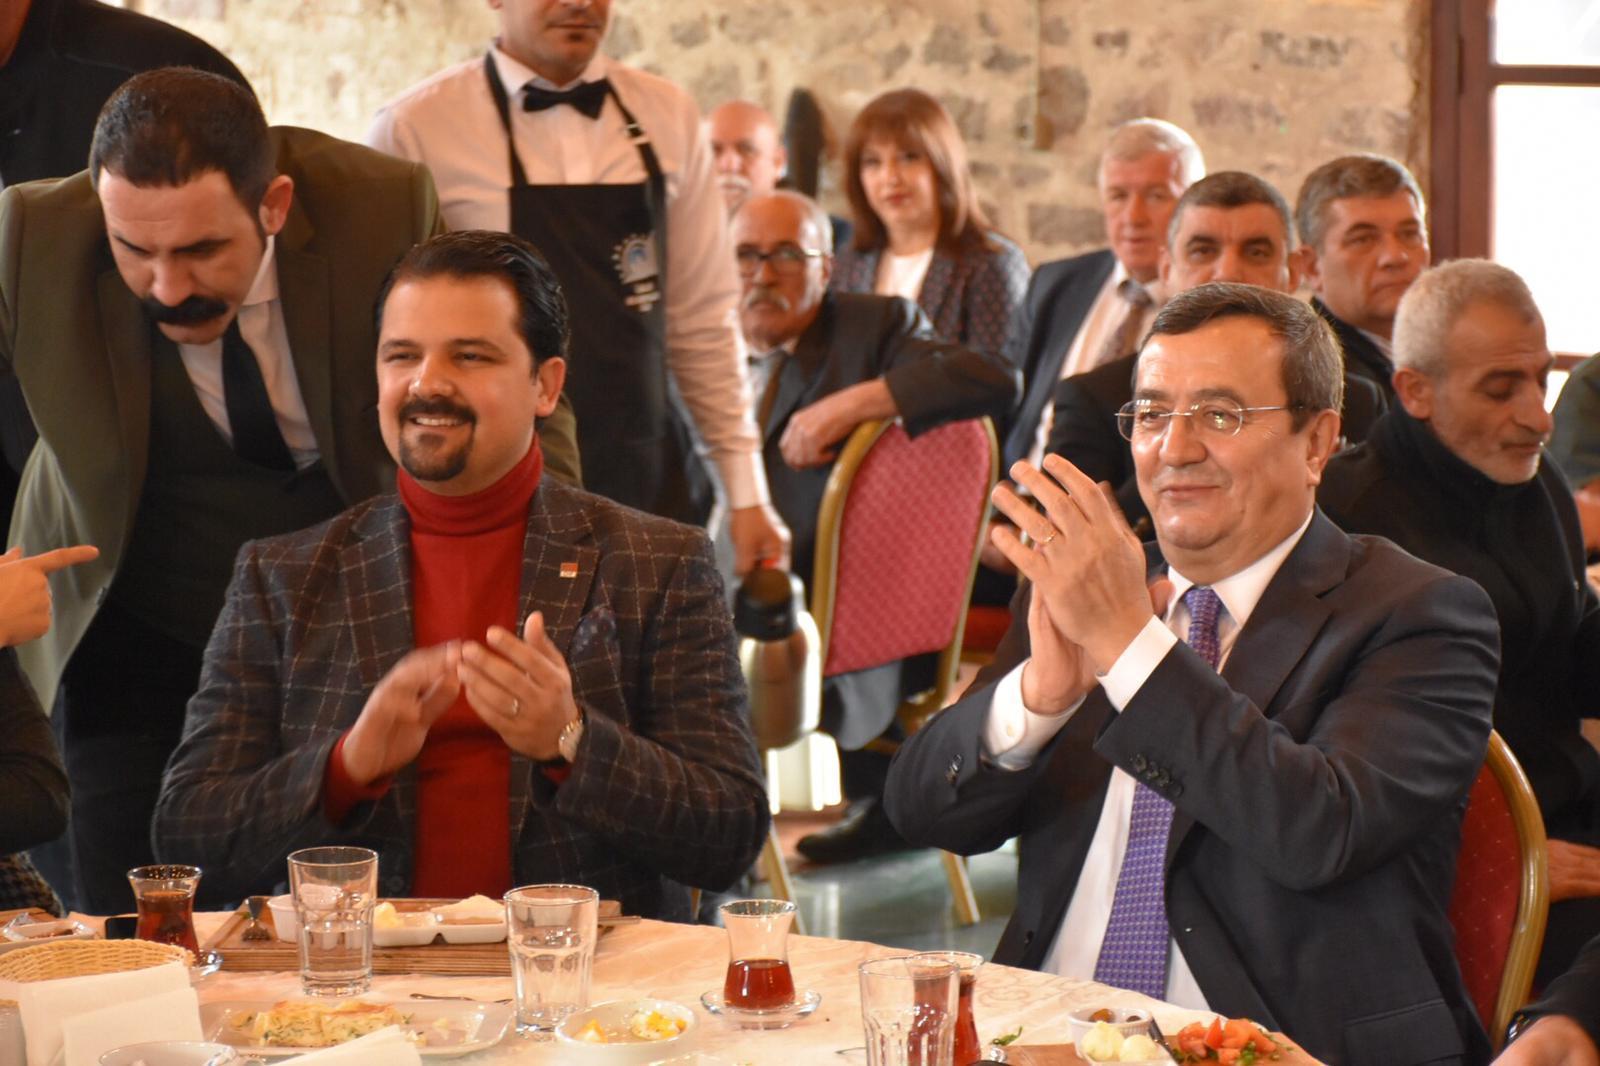 BATUR'DAN MUHTARLARA ELEKTRİK, SU VE İNTERNET SÖZÜ